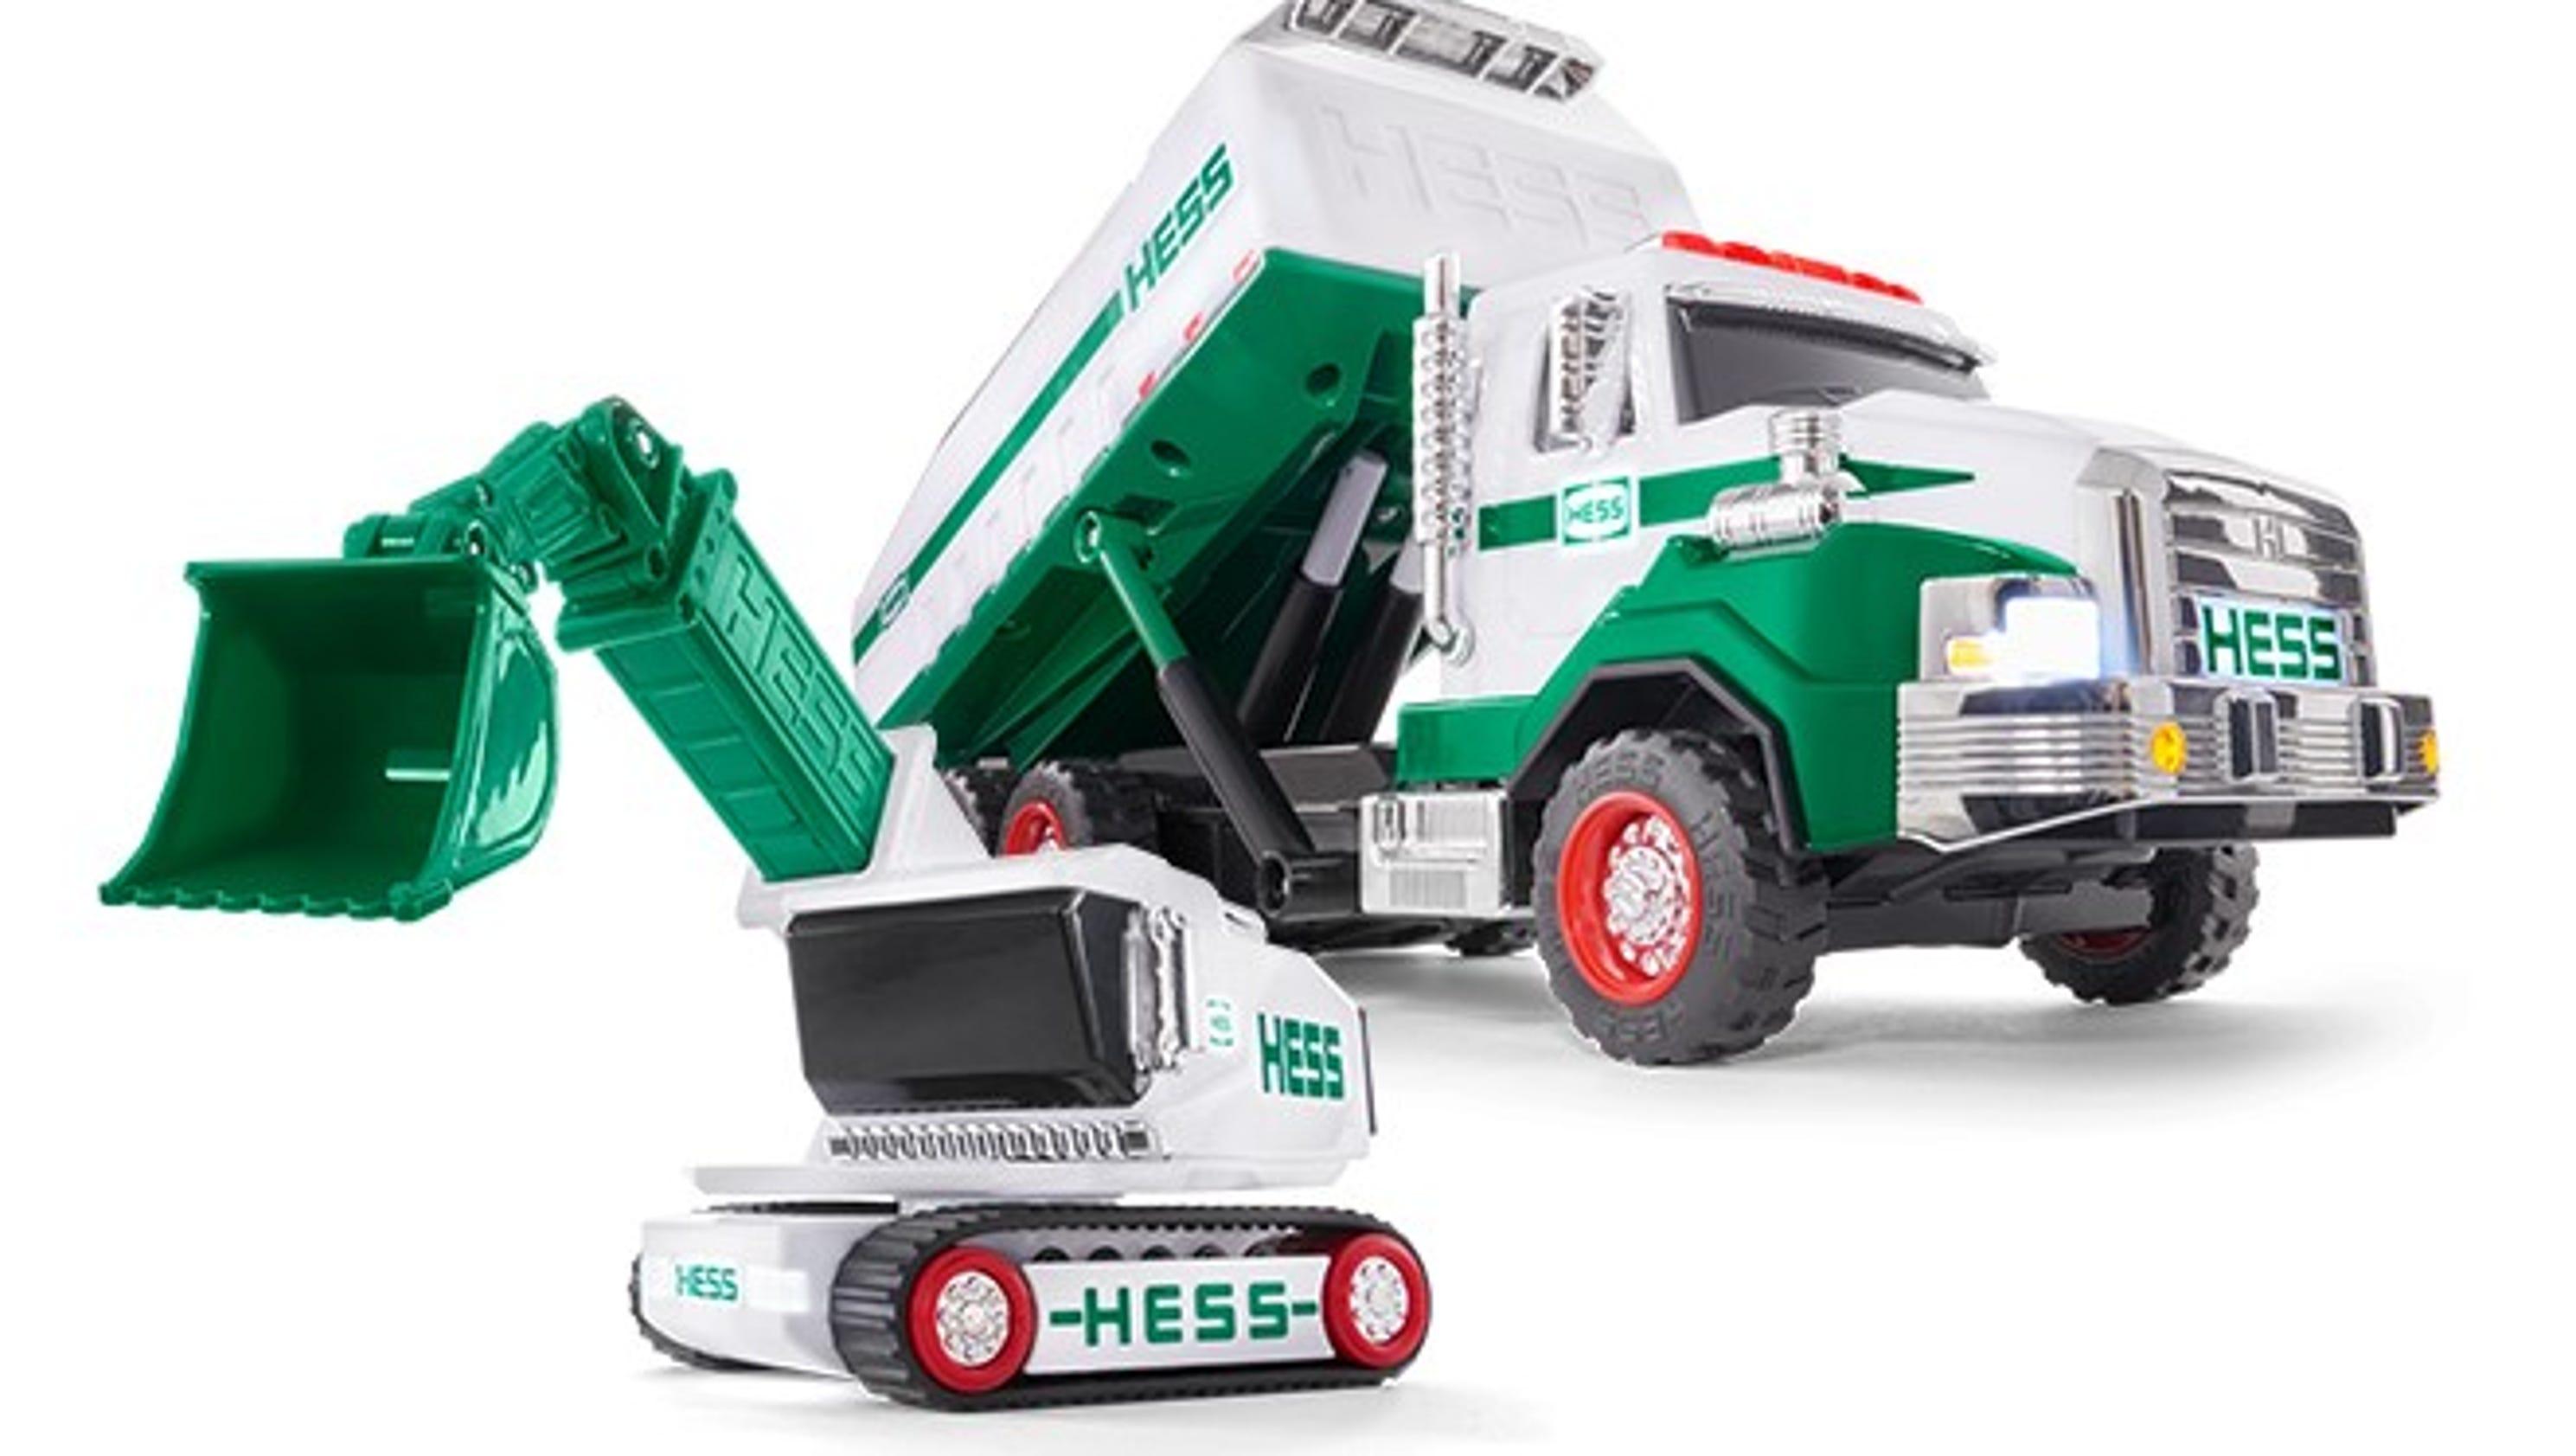 Toys For Trucks Greenville : Best christmas gifts for kids